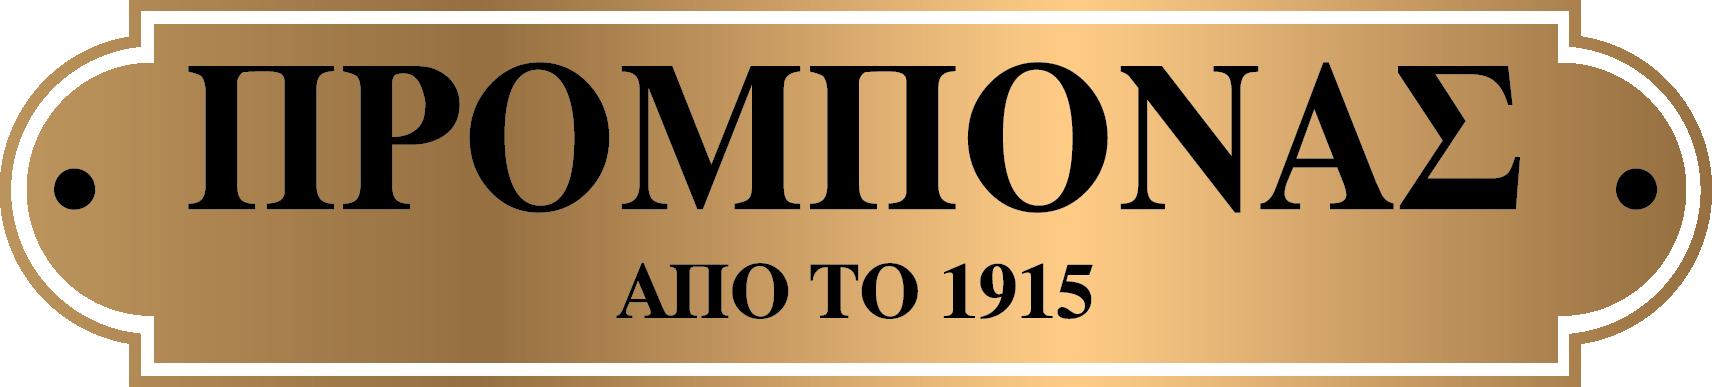 logo_promponas_gold